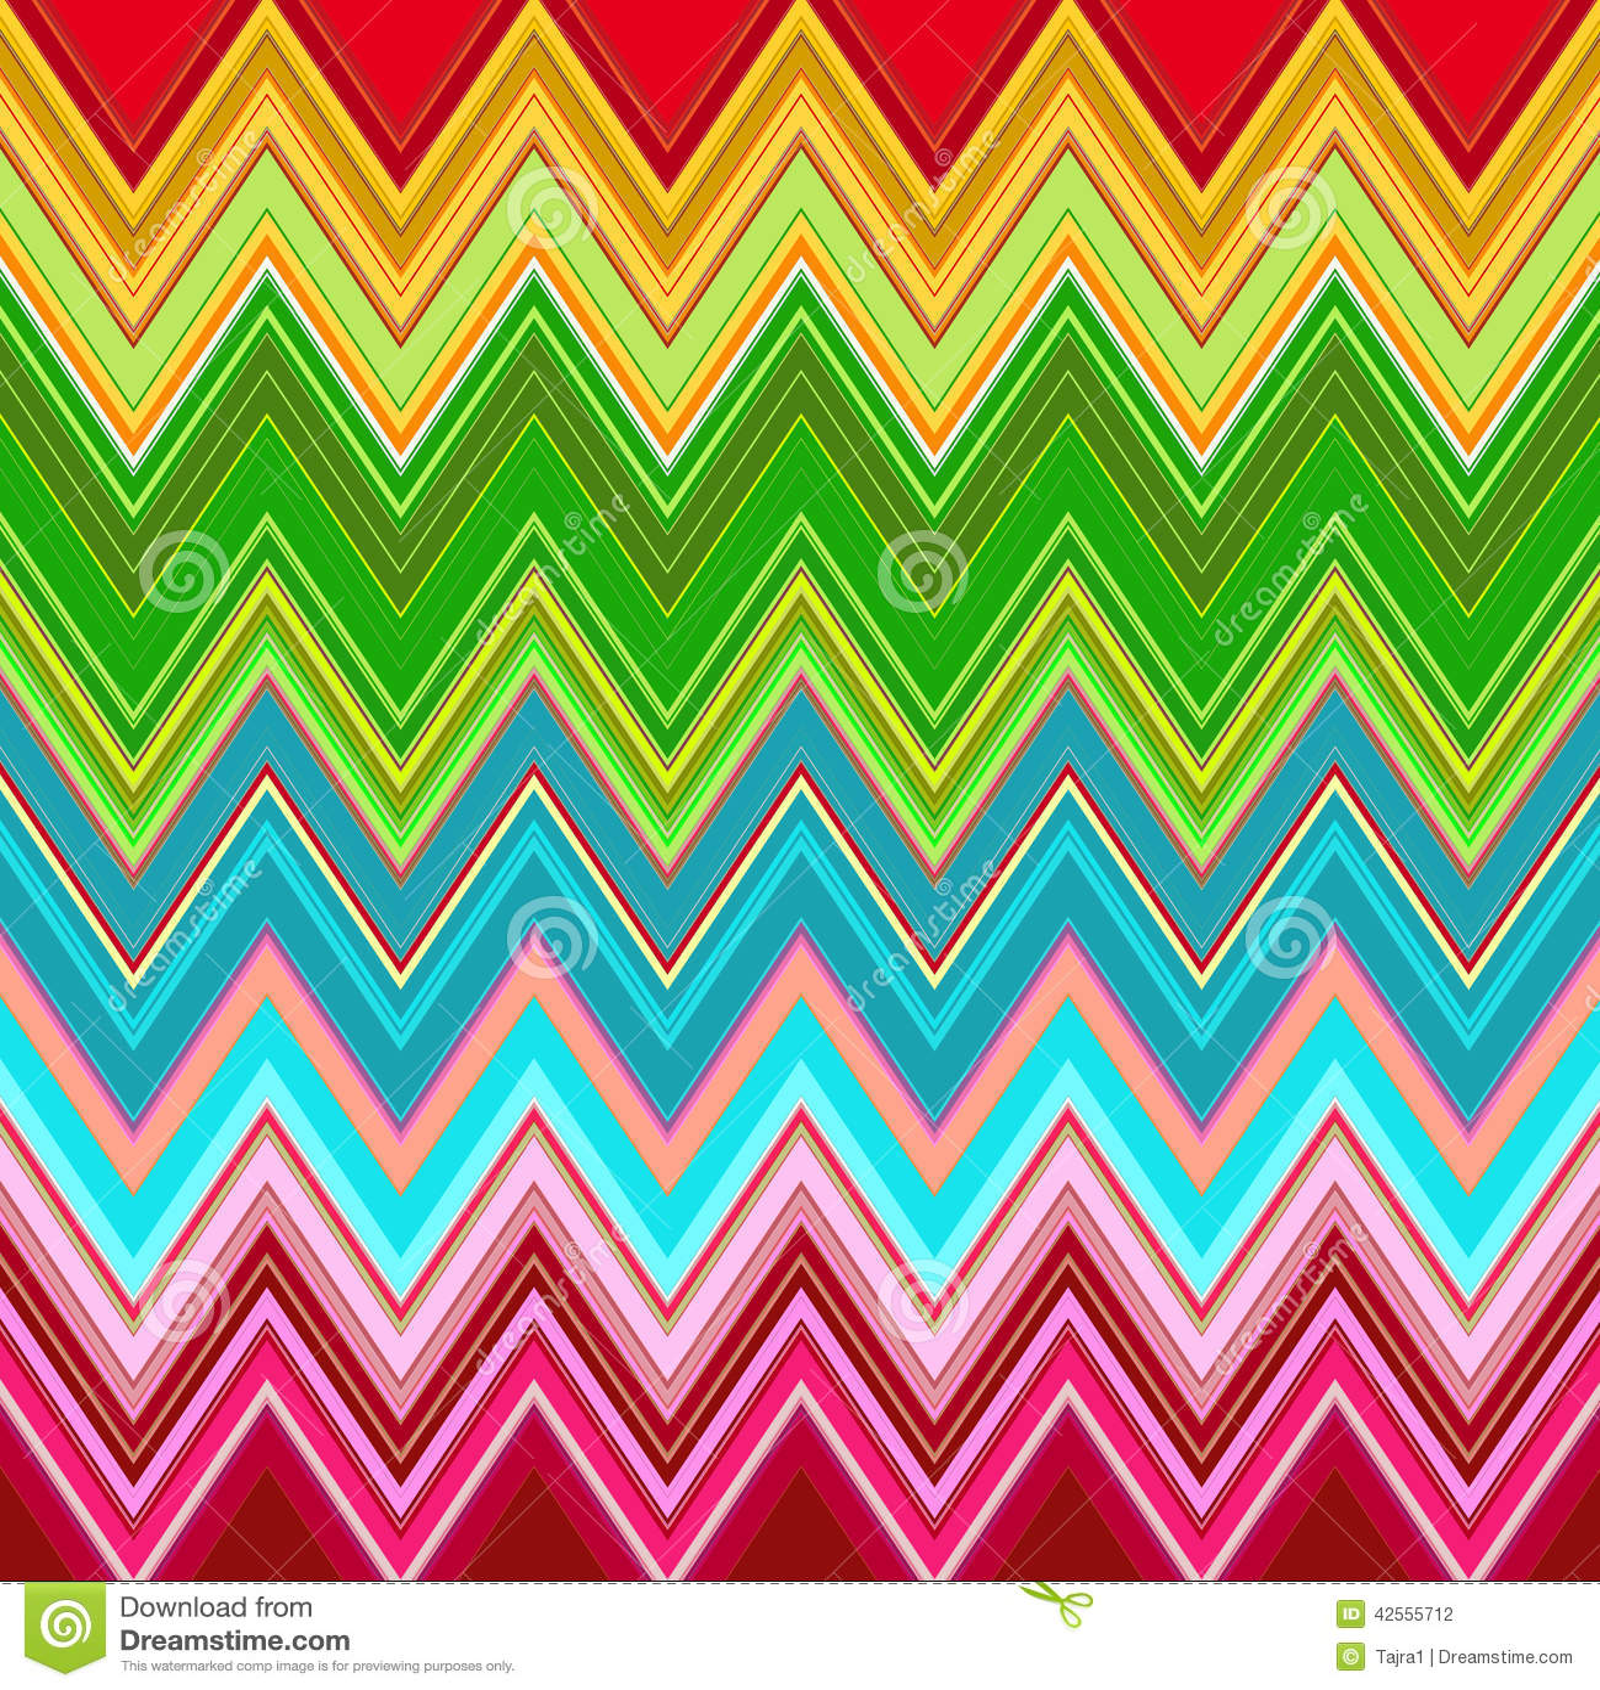 rainbow zig zag pattern stock illustration image of repeat 42555712. Black Bedroom Furniture Sets. Home Design Ideas